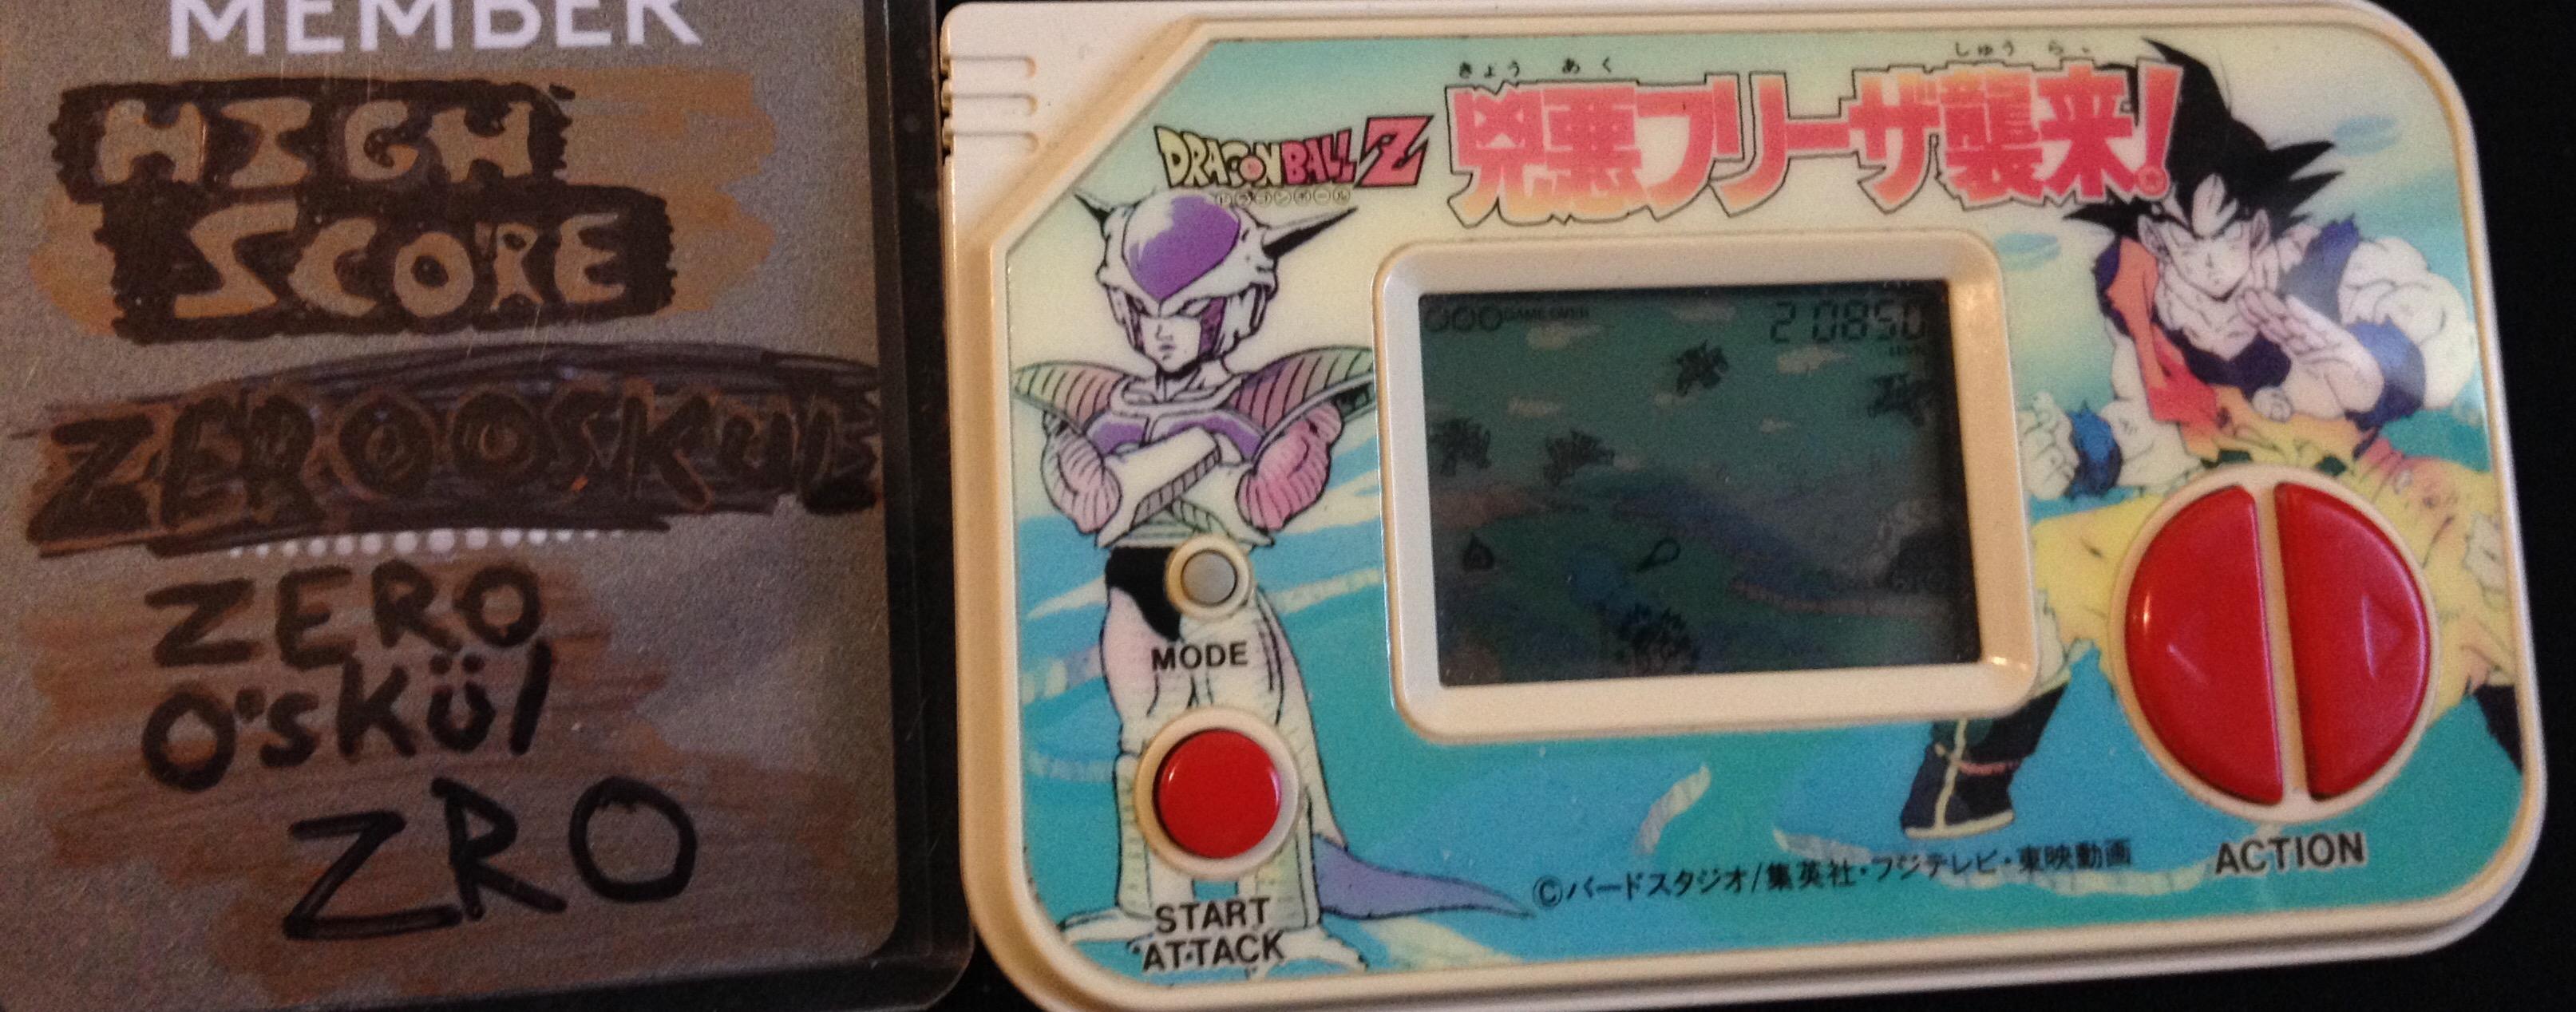 zerooskul: Dragon Ball Z: Ky?aku Freeza Sh?rai! [Level 1] (Dedicated Handheld) 20,850 points on 2019-07-14 16:46:17